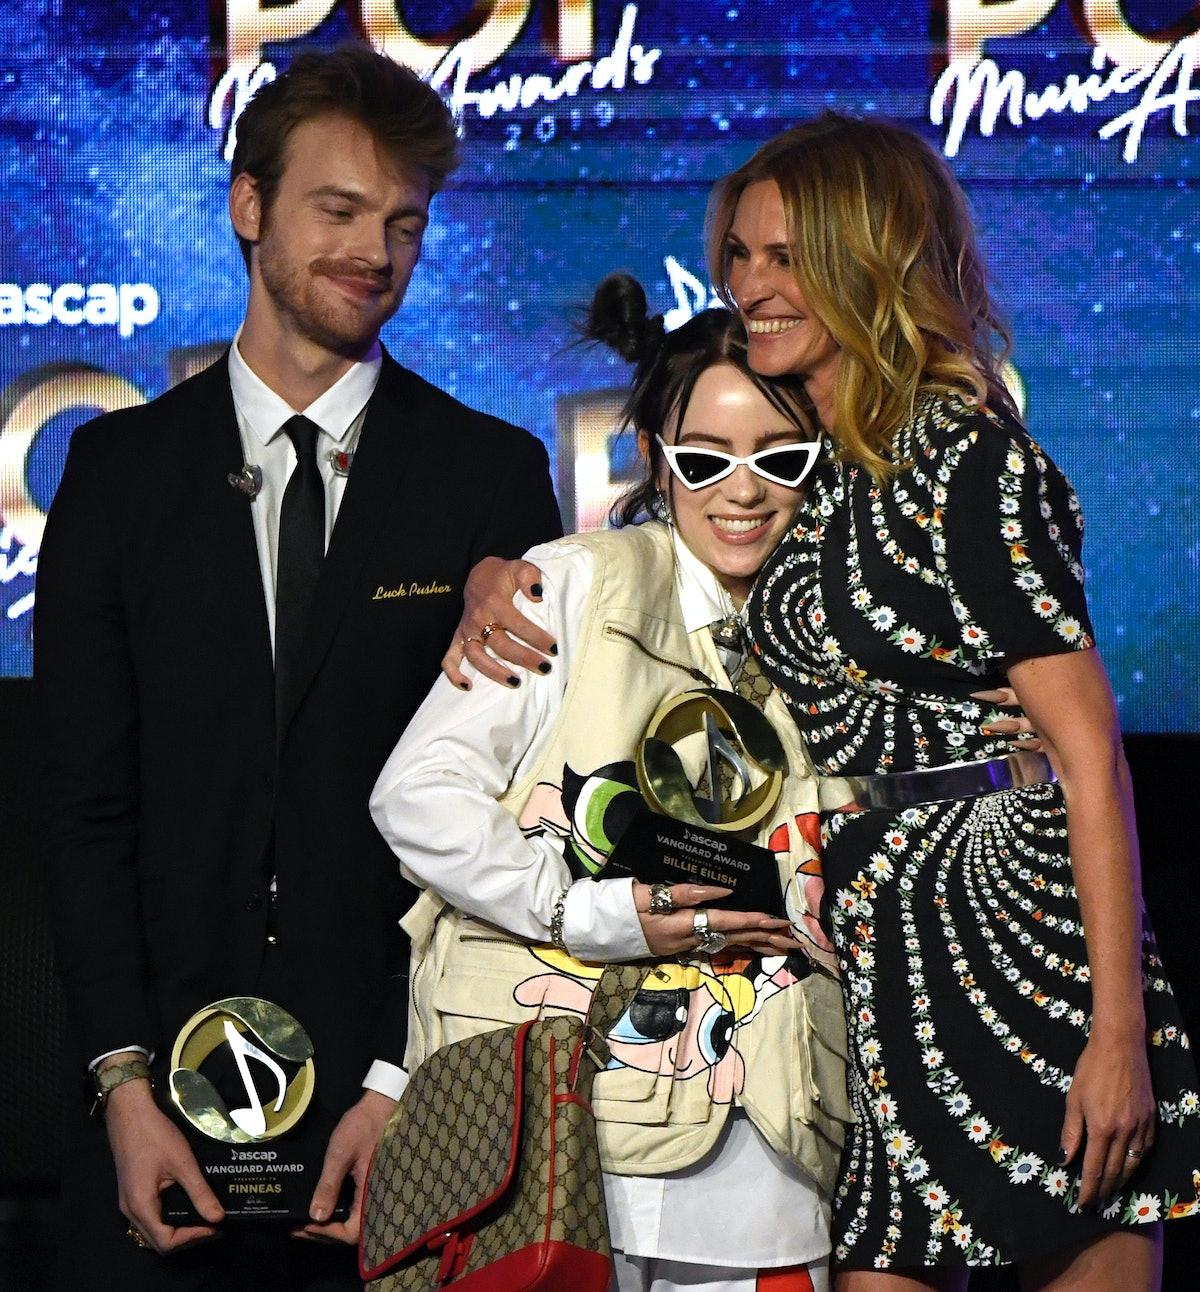 36th Annual ASCAP Pop Music Awards - Show